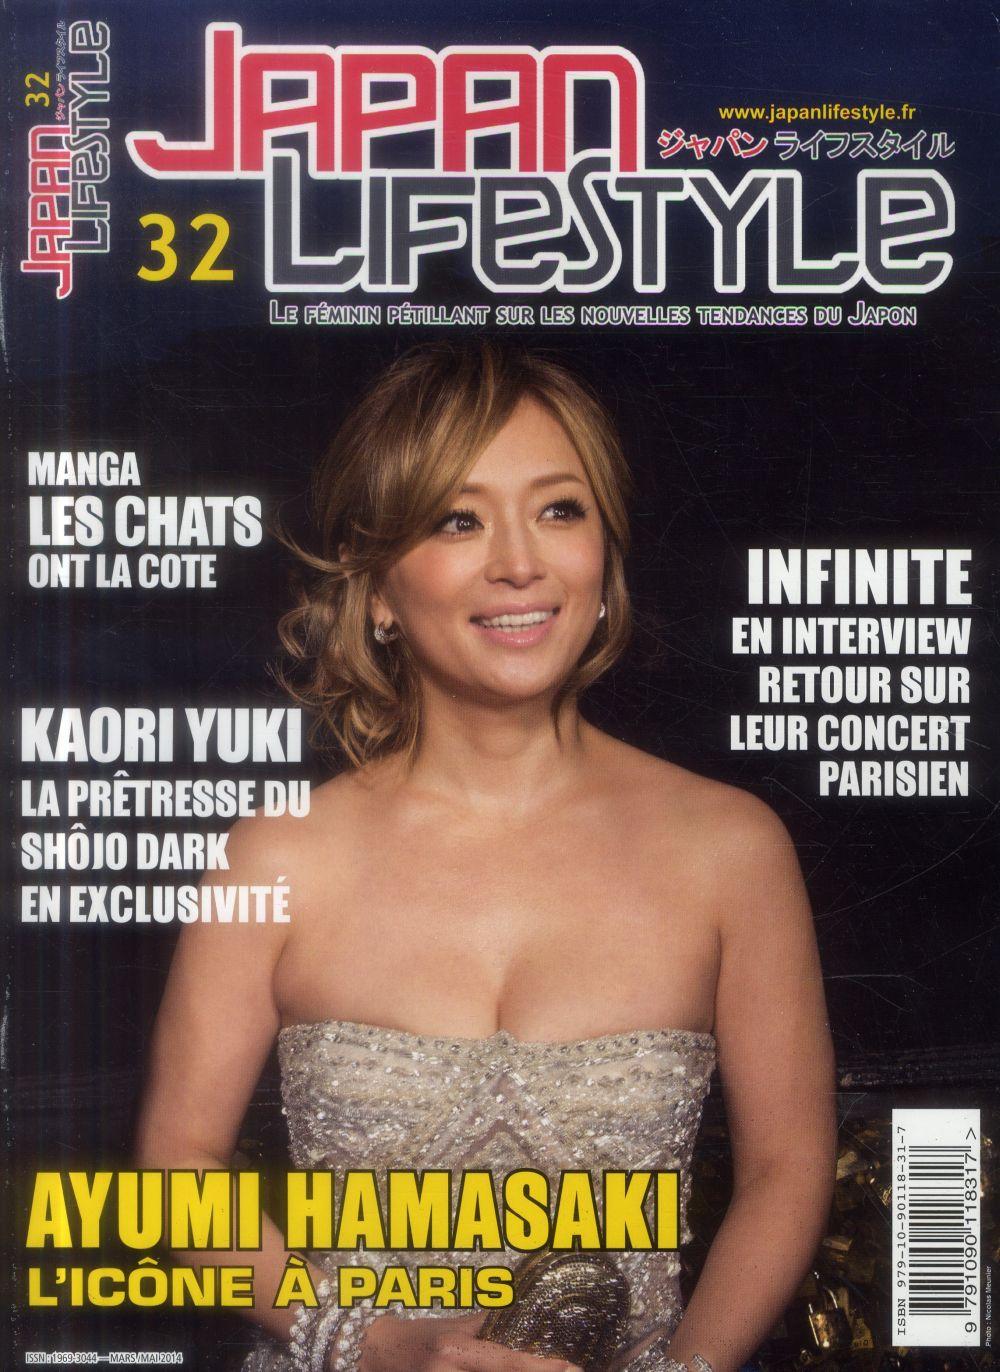 JAPAN LIFESTYLE 32 MARS - MAI 2014